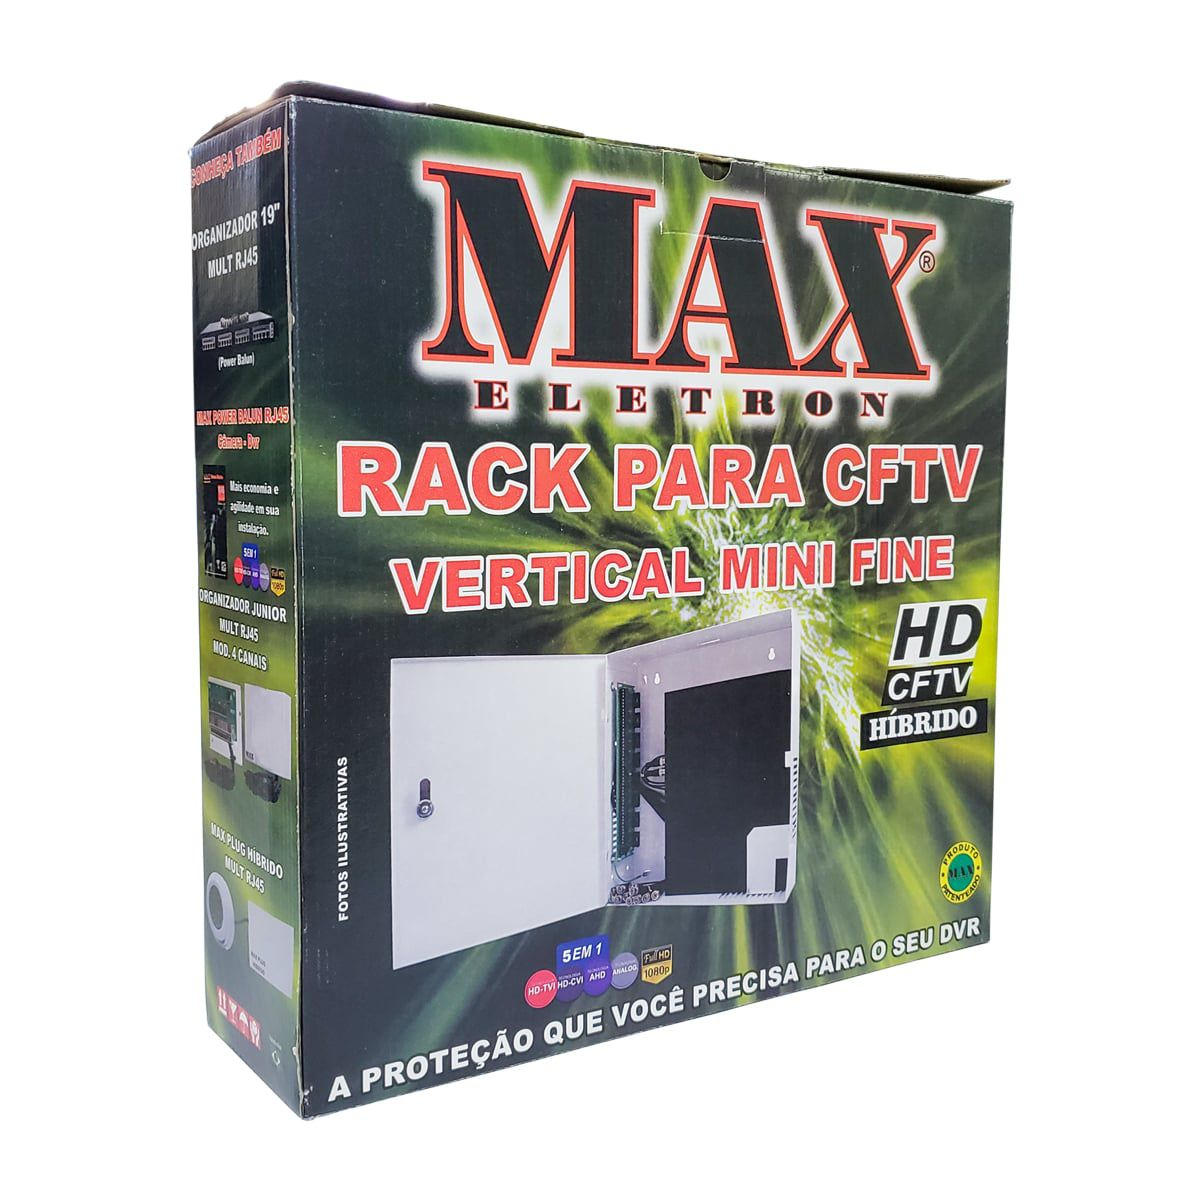 Rack Vertical Fine c/ Placa Eletrônica 8 Canais Max Eletron  - CFTV Clube | Brasil